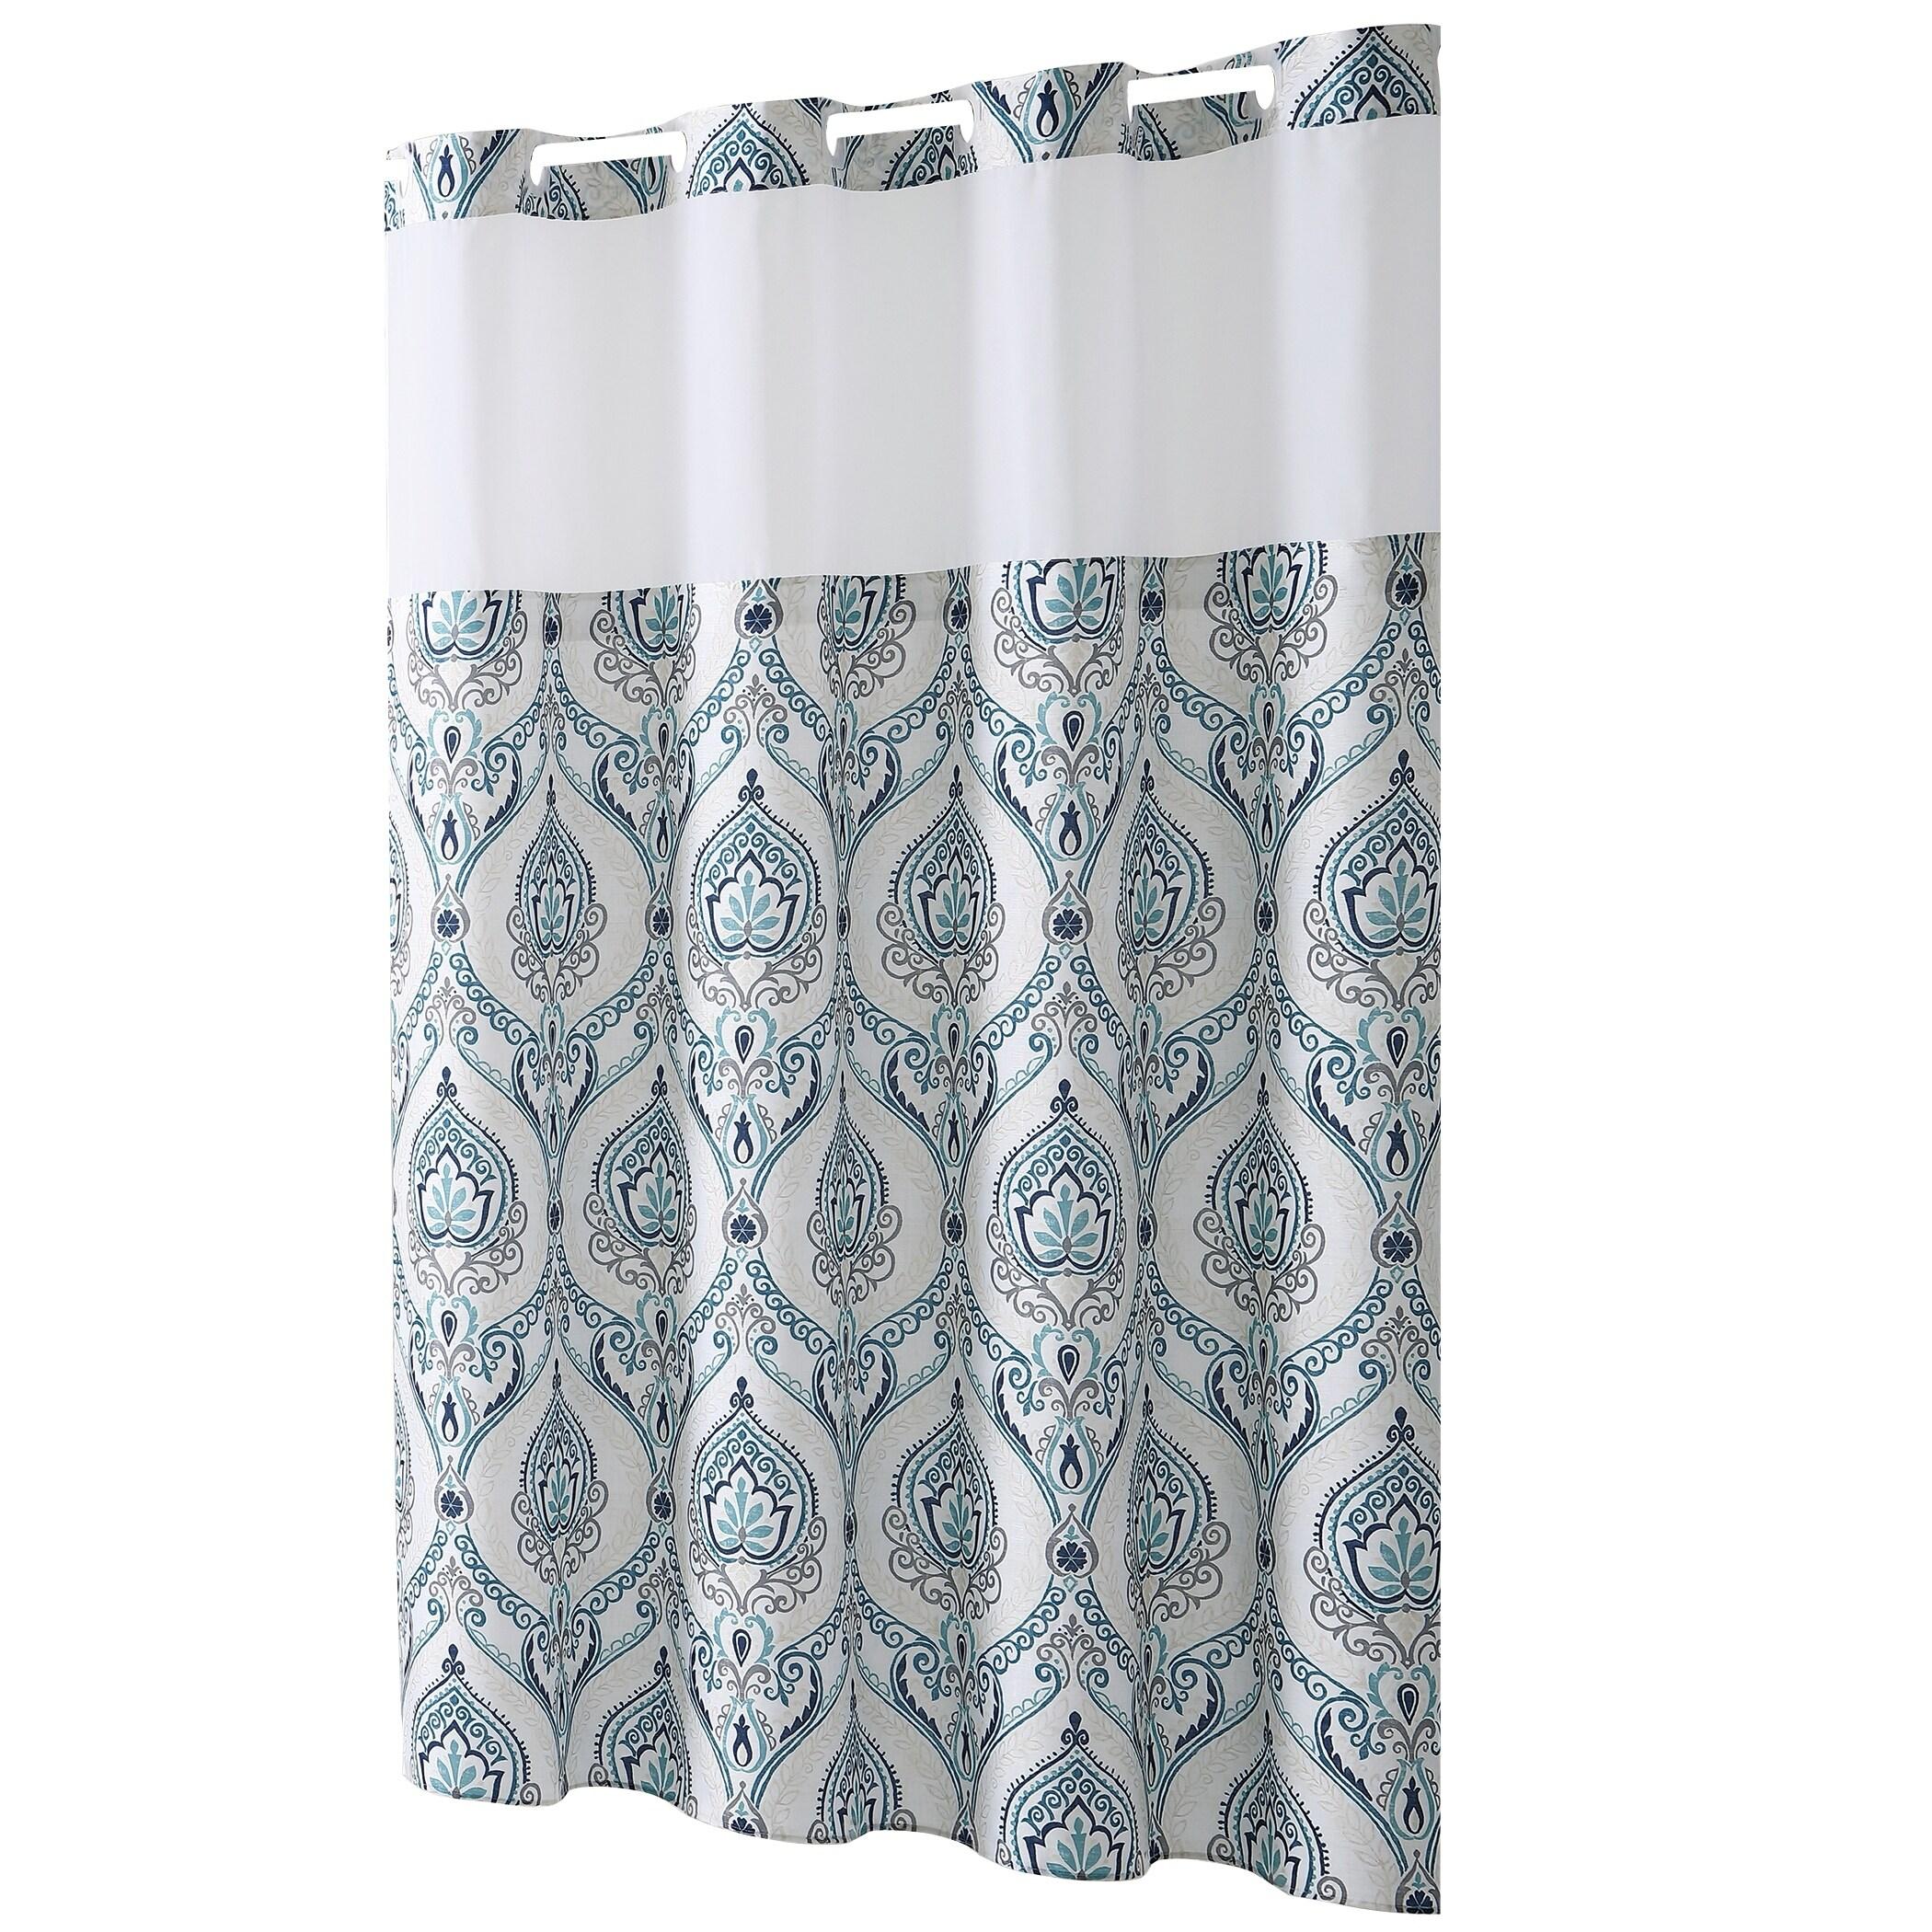 Shop HooklessR Shower Curtain French Damask Print Aqua